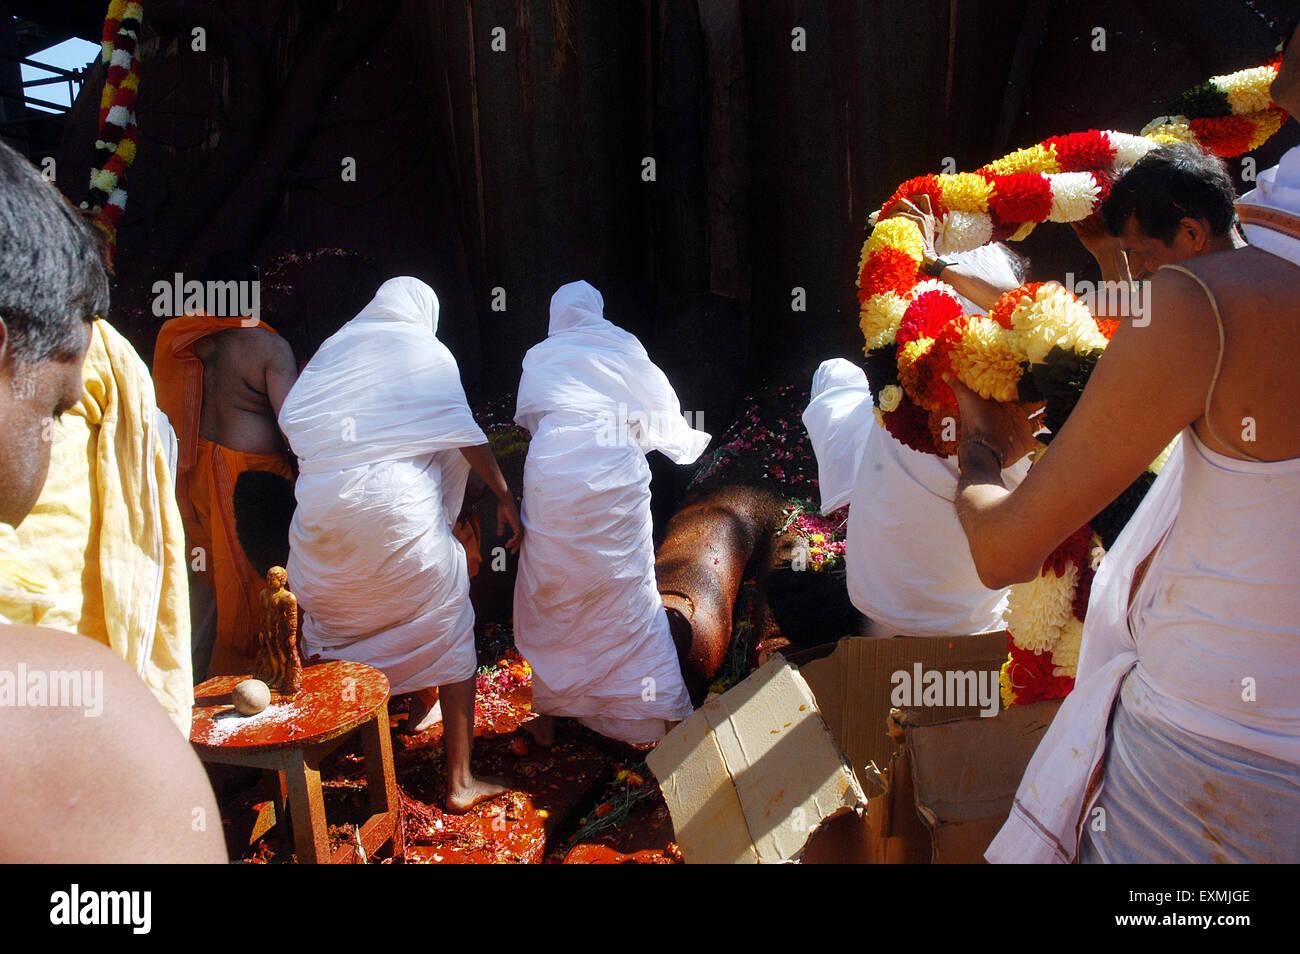 Jain sadhavis touch foot 57 feet statue of lord Bahubali Gomateshvara Mahamasthakabisheka celebration Sravanabelagola - Stock Image